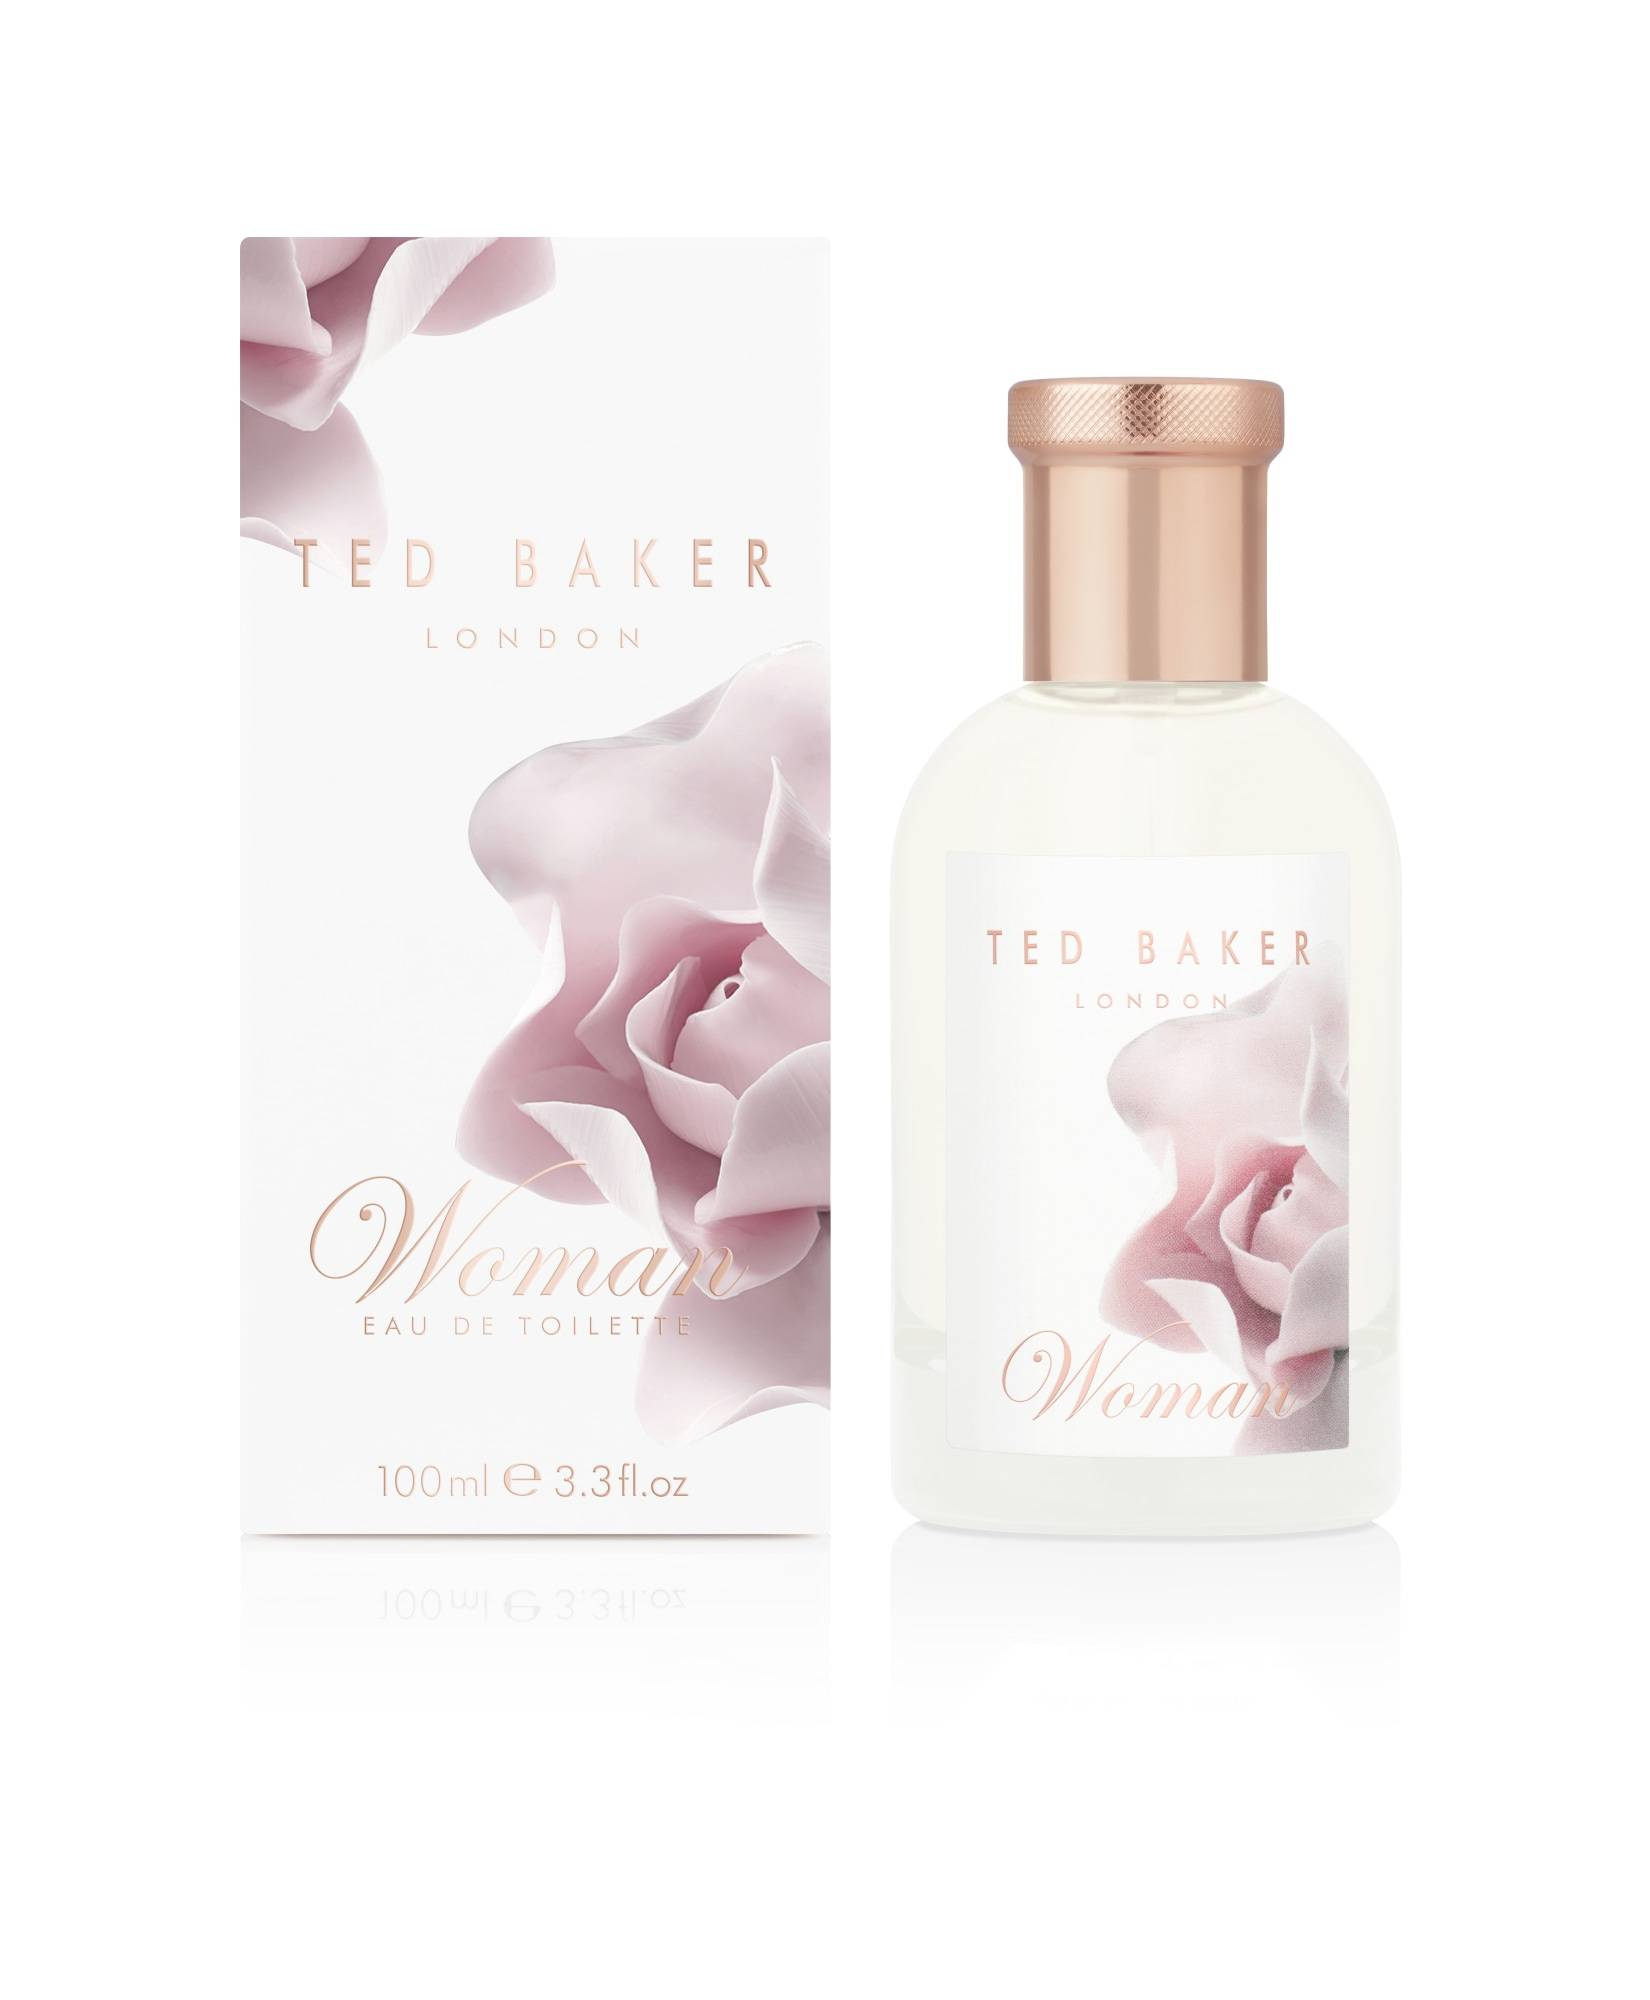 Ted Baker Woman Eau de Toilette 100 ml naisten tuoksu